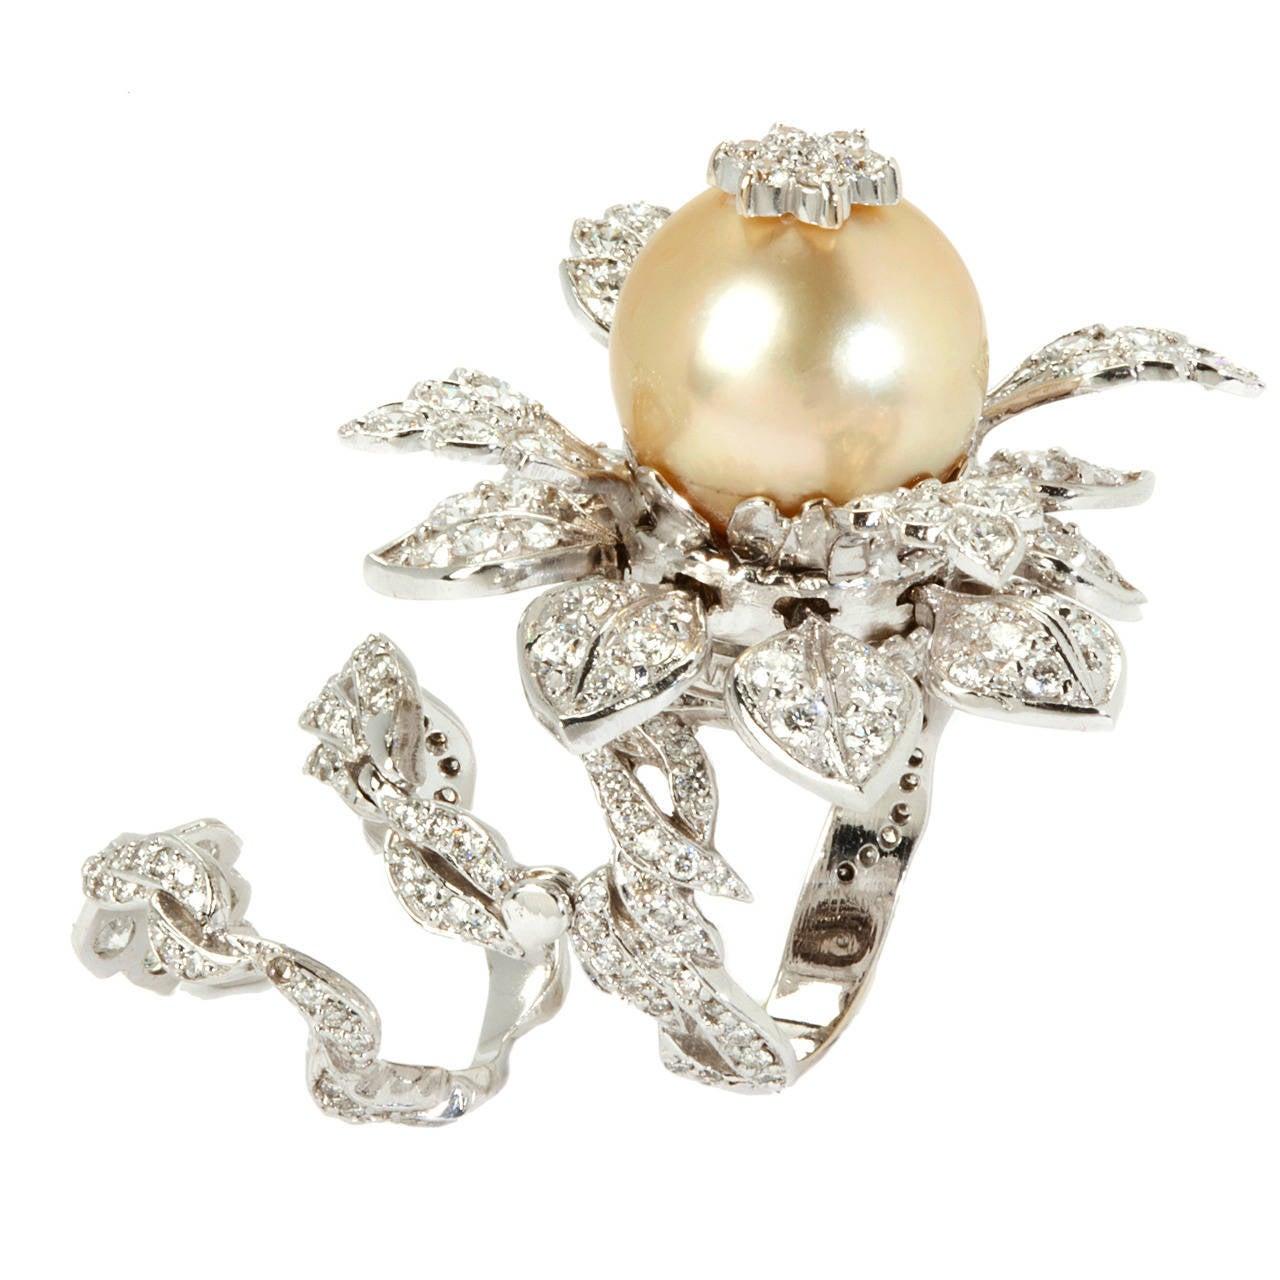 stambolian pearl diamond gold tremble ring at 1stdibs. Black Bedroom Furniture Sets. Home Design Ideas